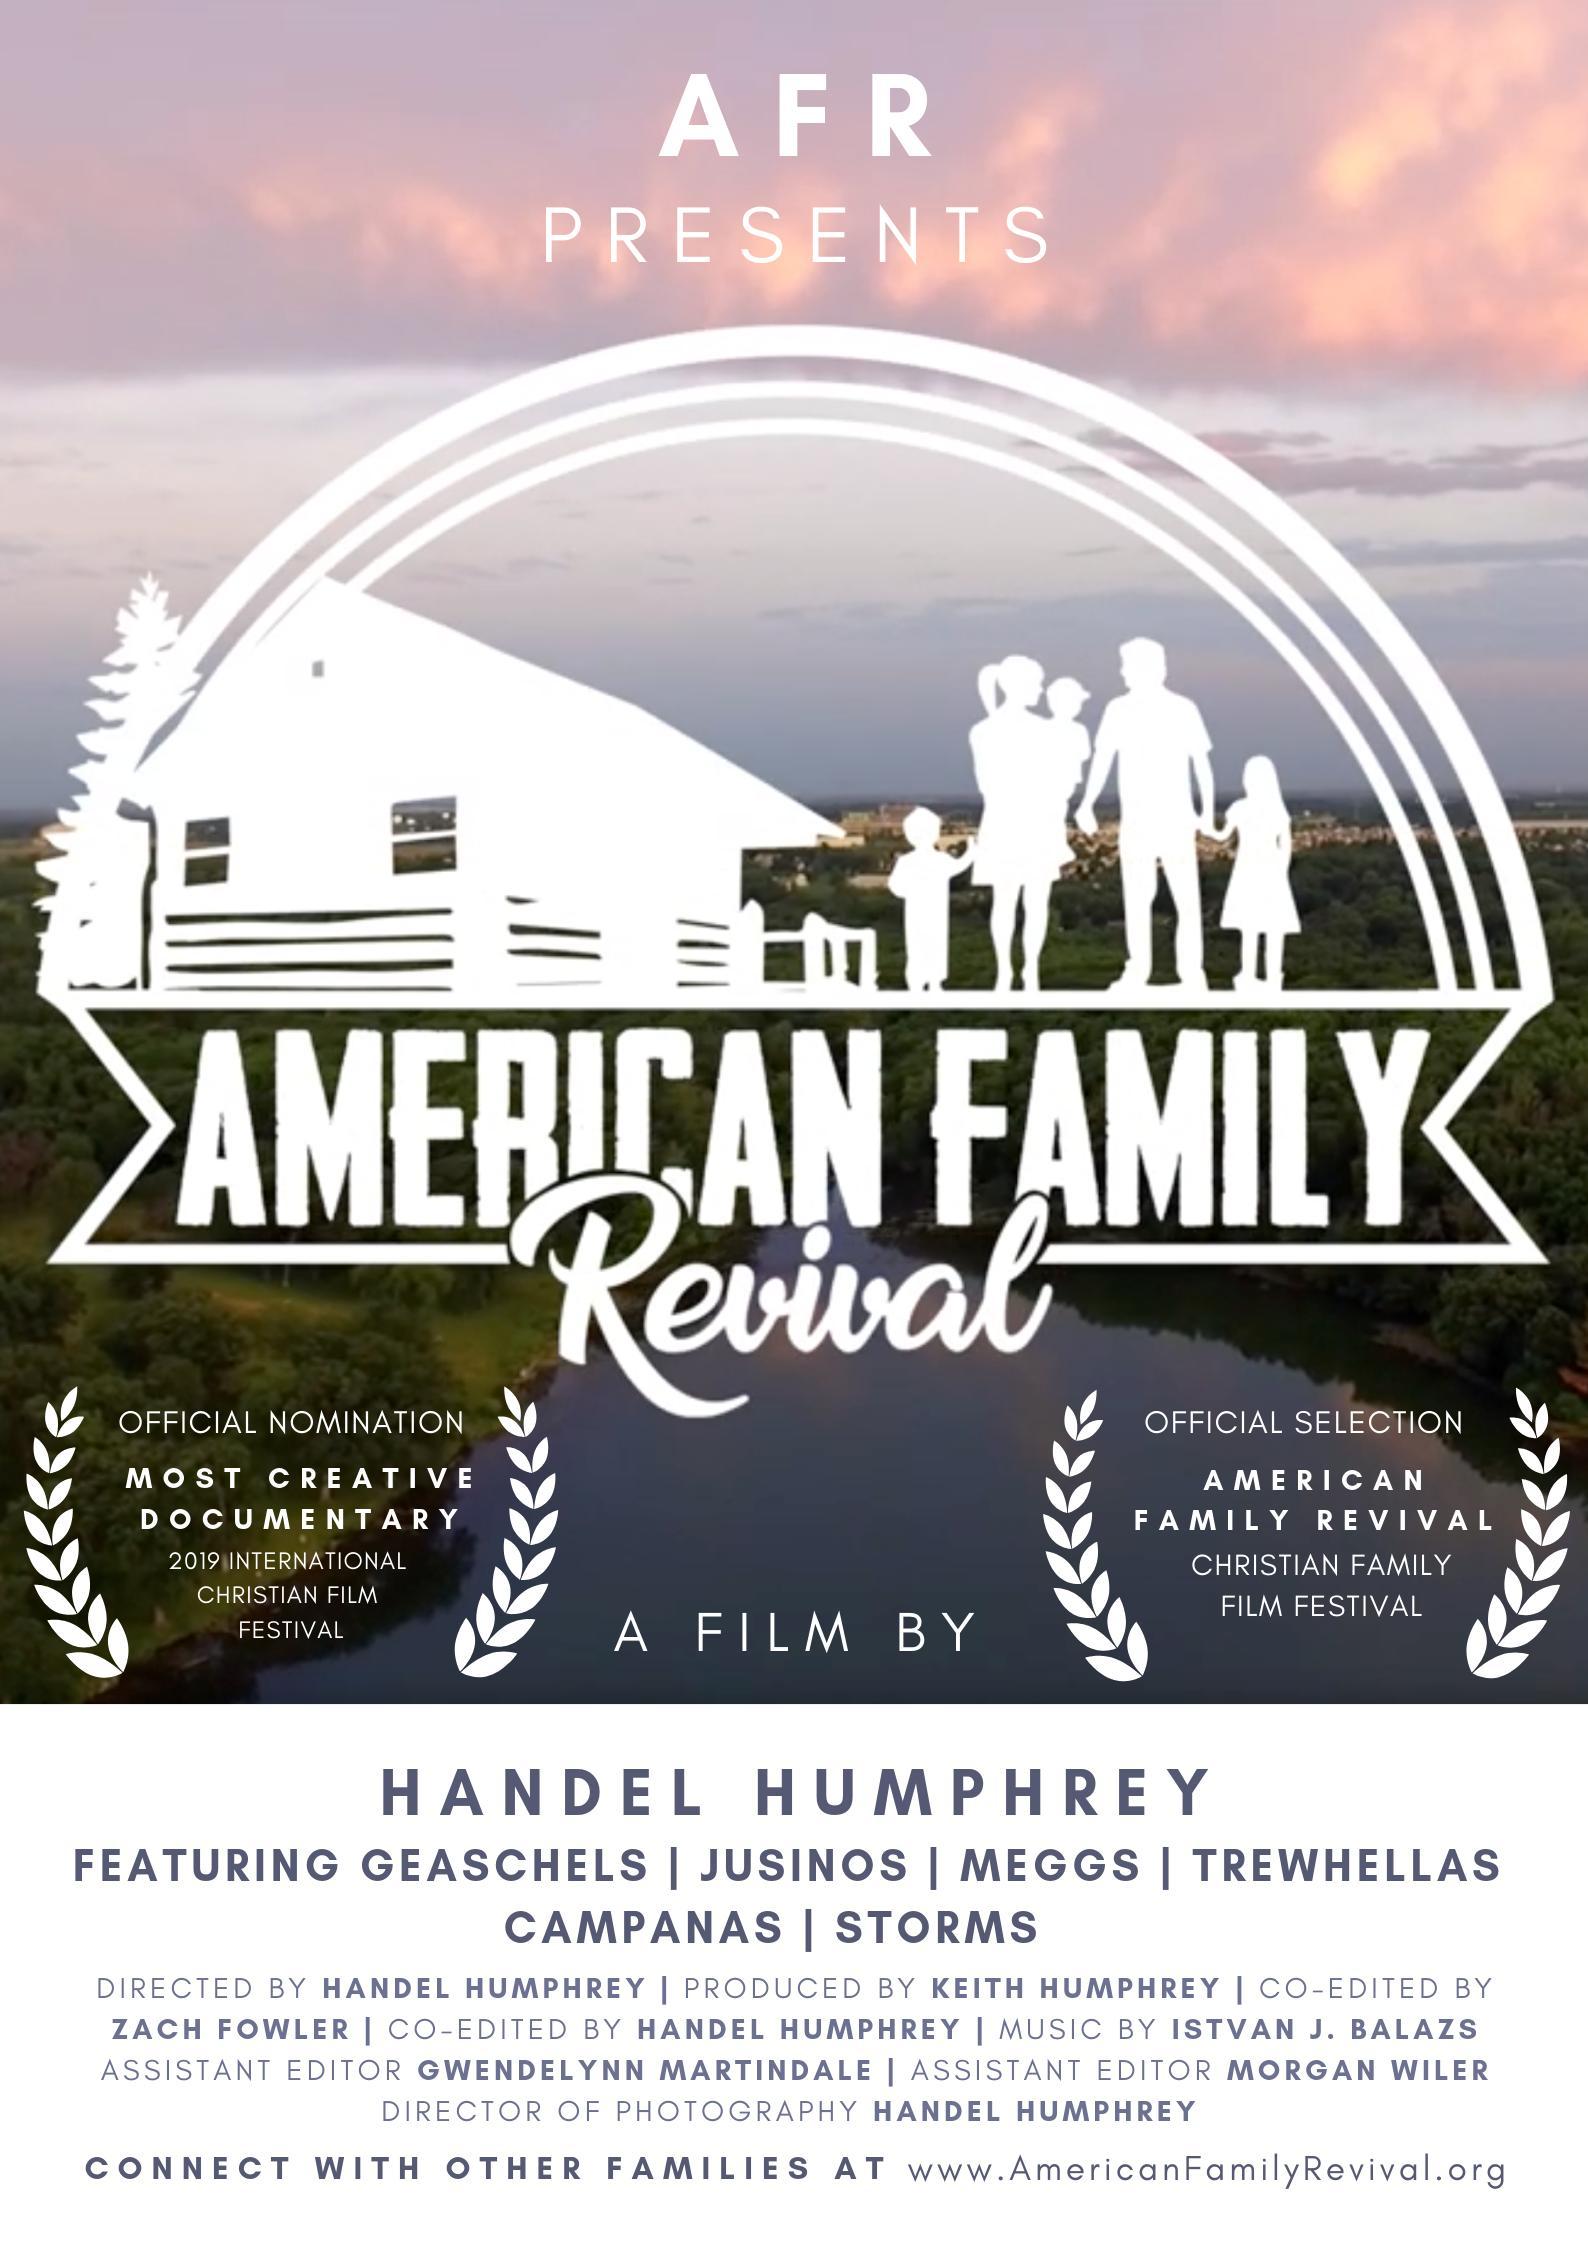 AMERICAN FAMILY REVIVAL